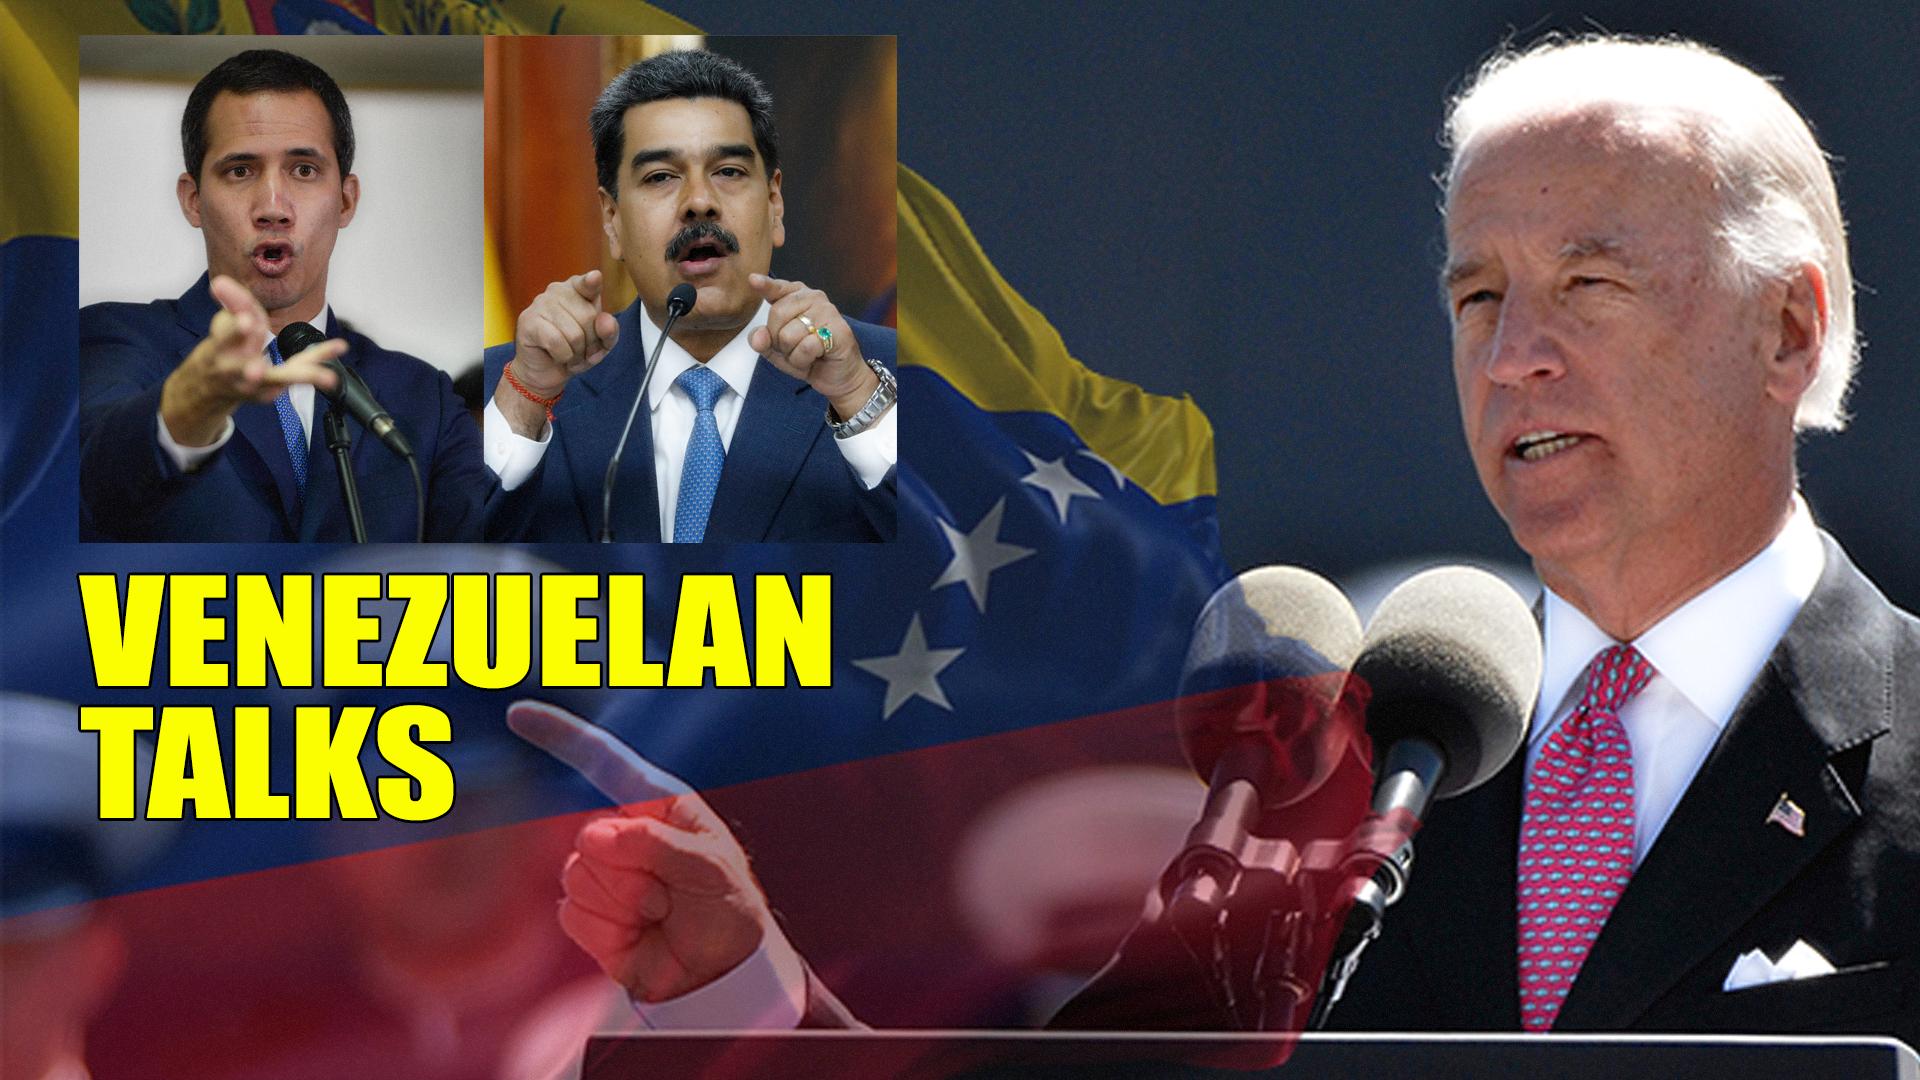 Venezuelan talks, with promise of US sanctions relief